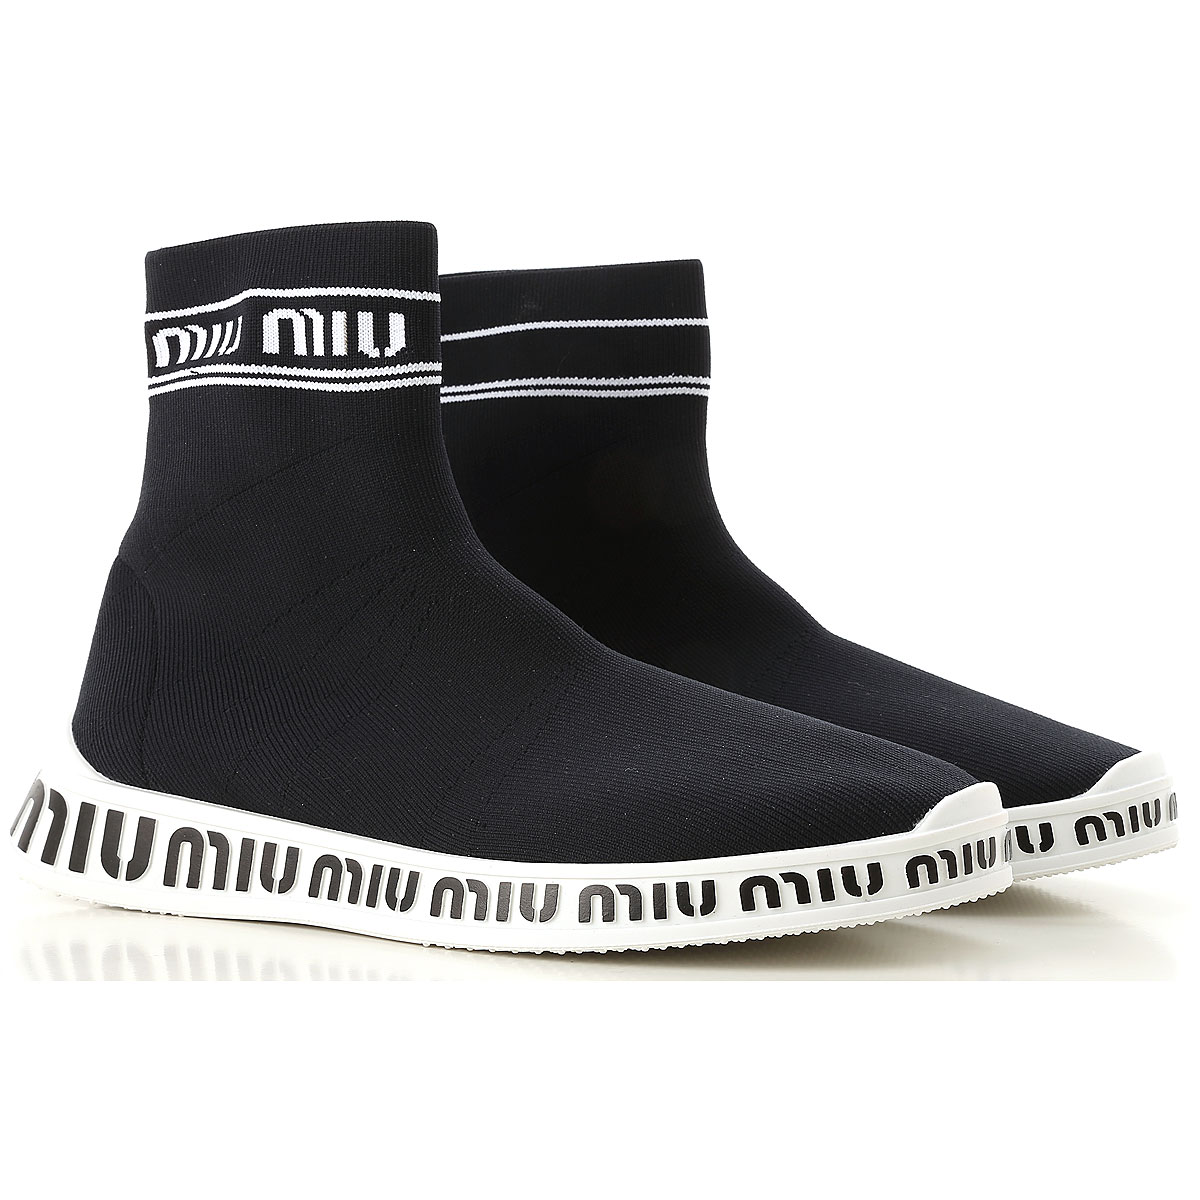 Image of Miu Miu Boots for Women, Booties, Black, Fabric, 2017, 10 6 7 8 8.5 9